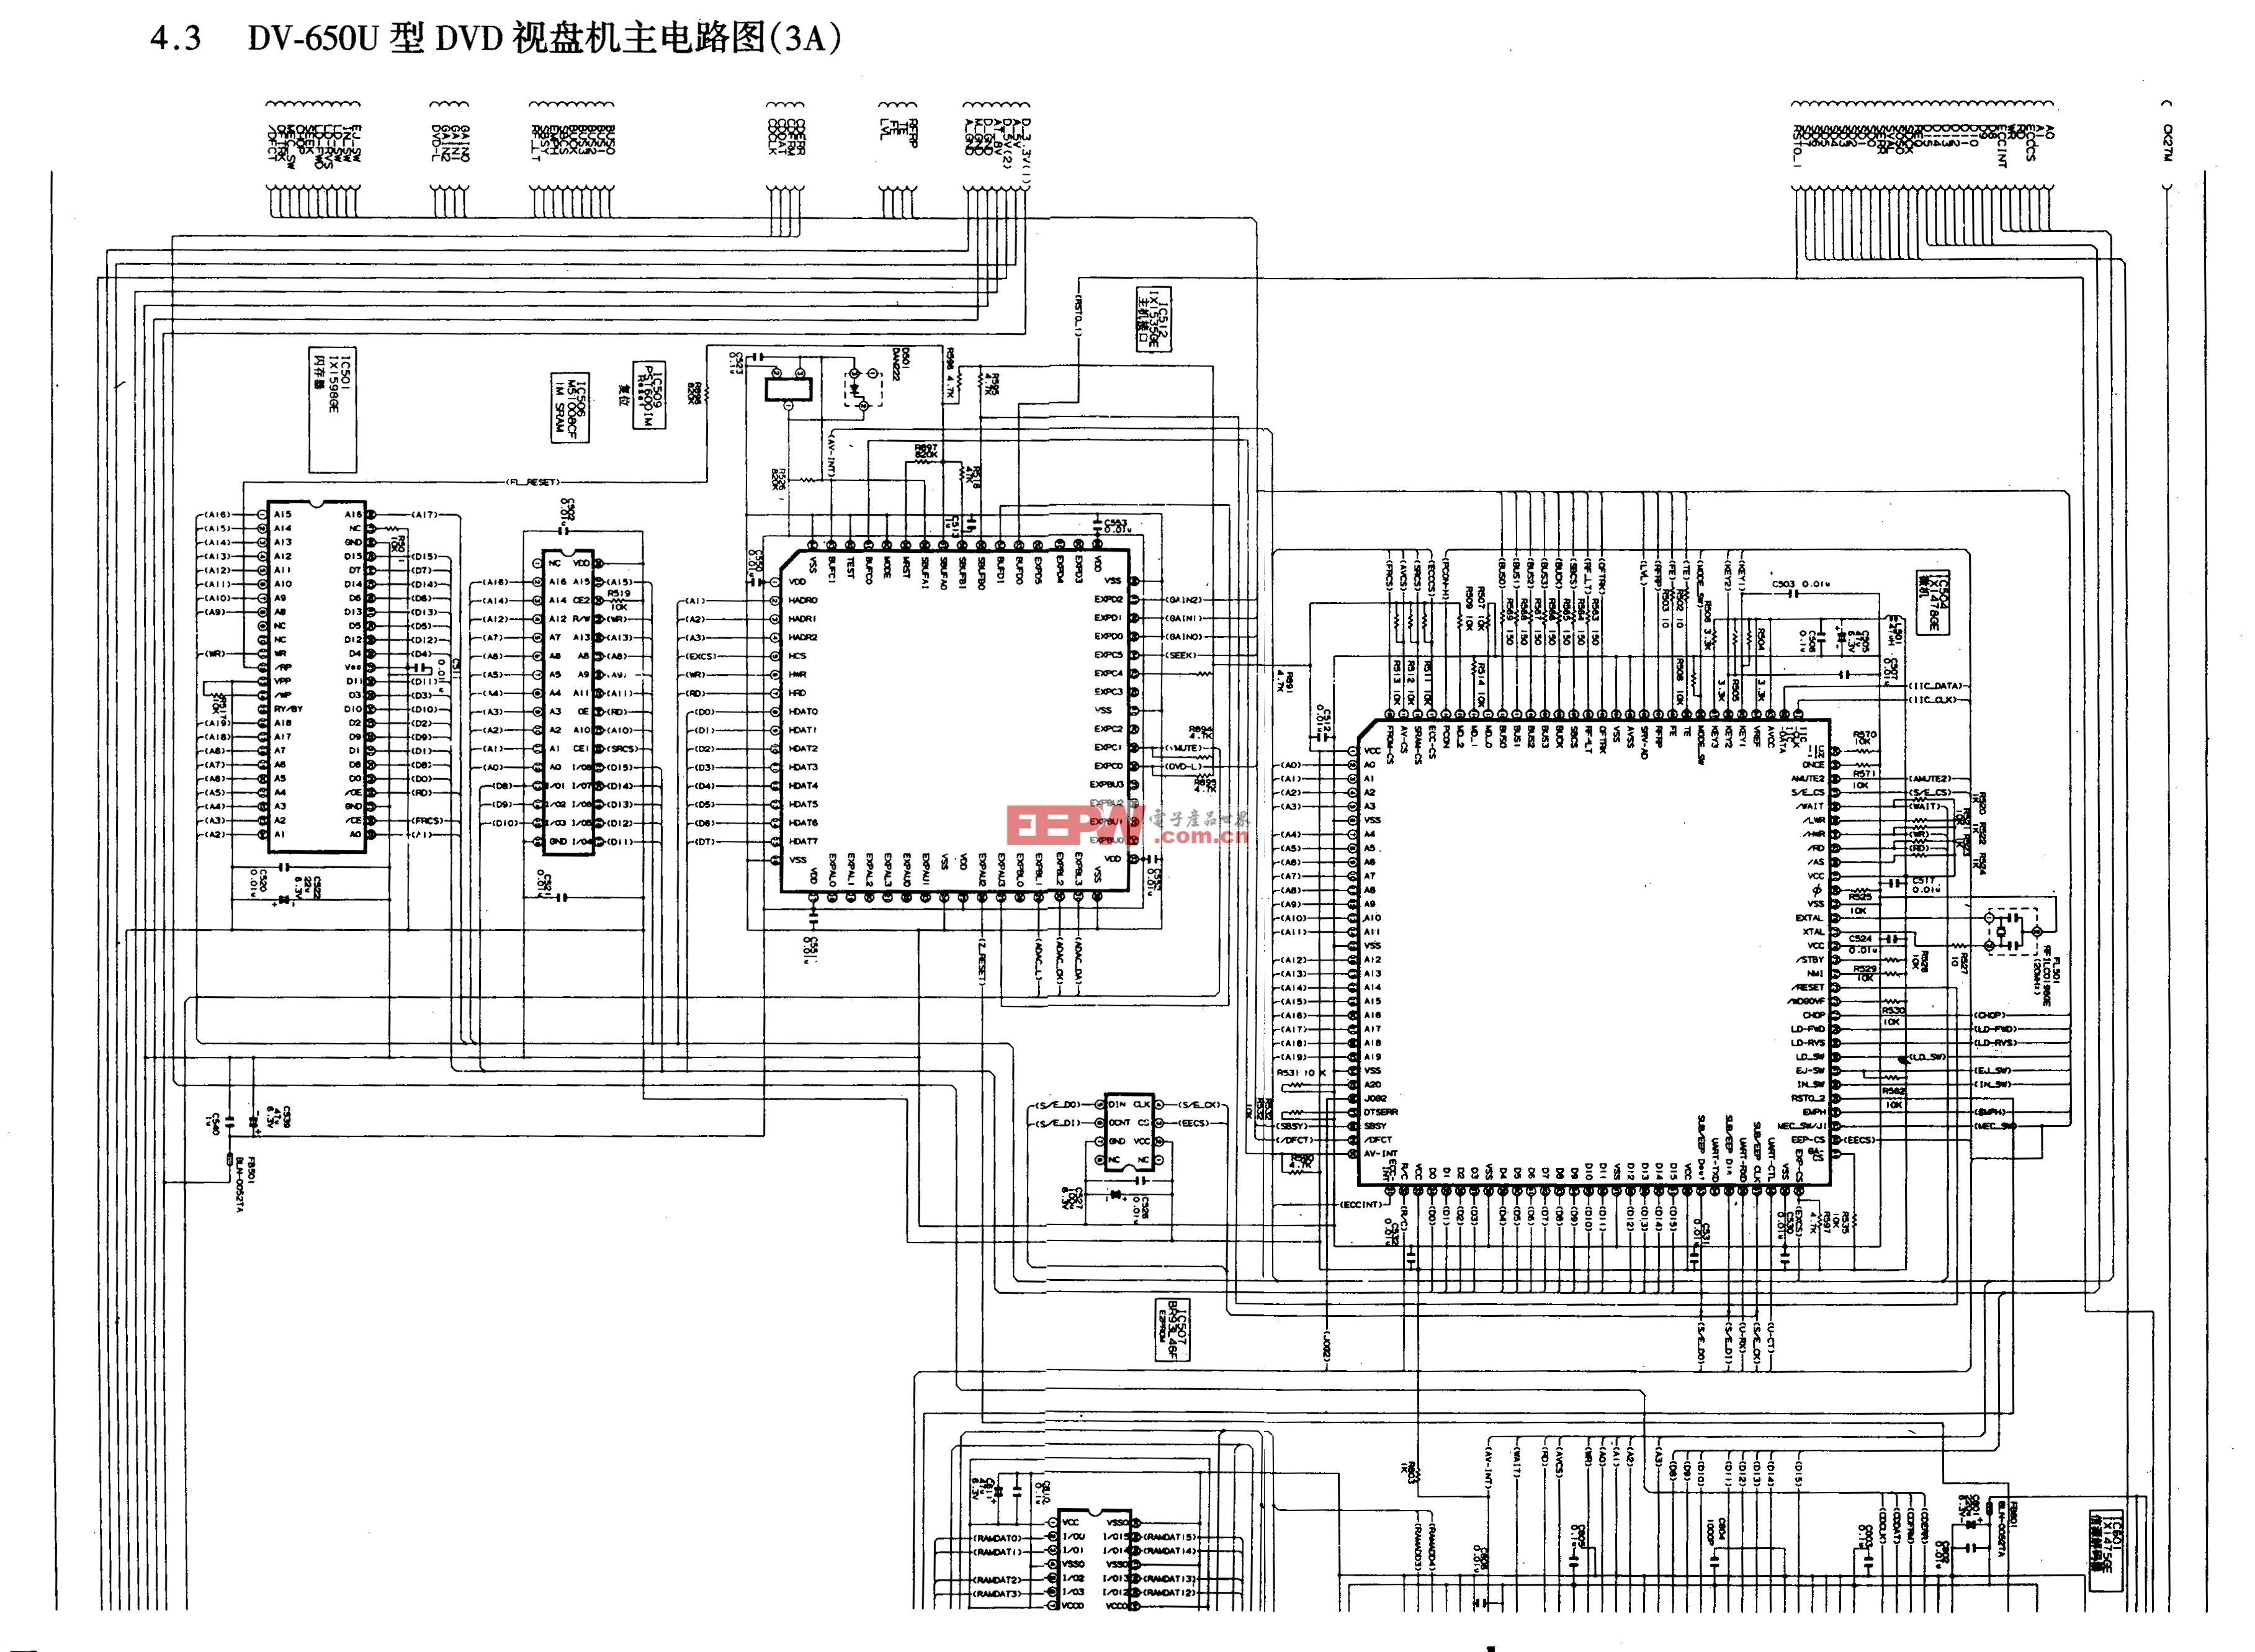 SHARP DV-600U、DV-650U型DVD-主电路图3A